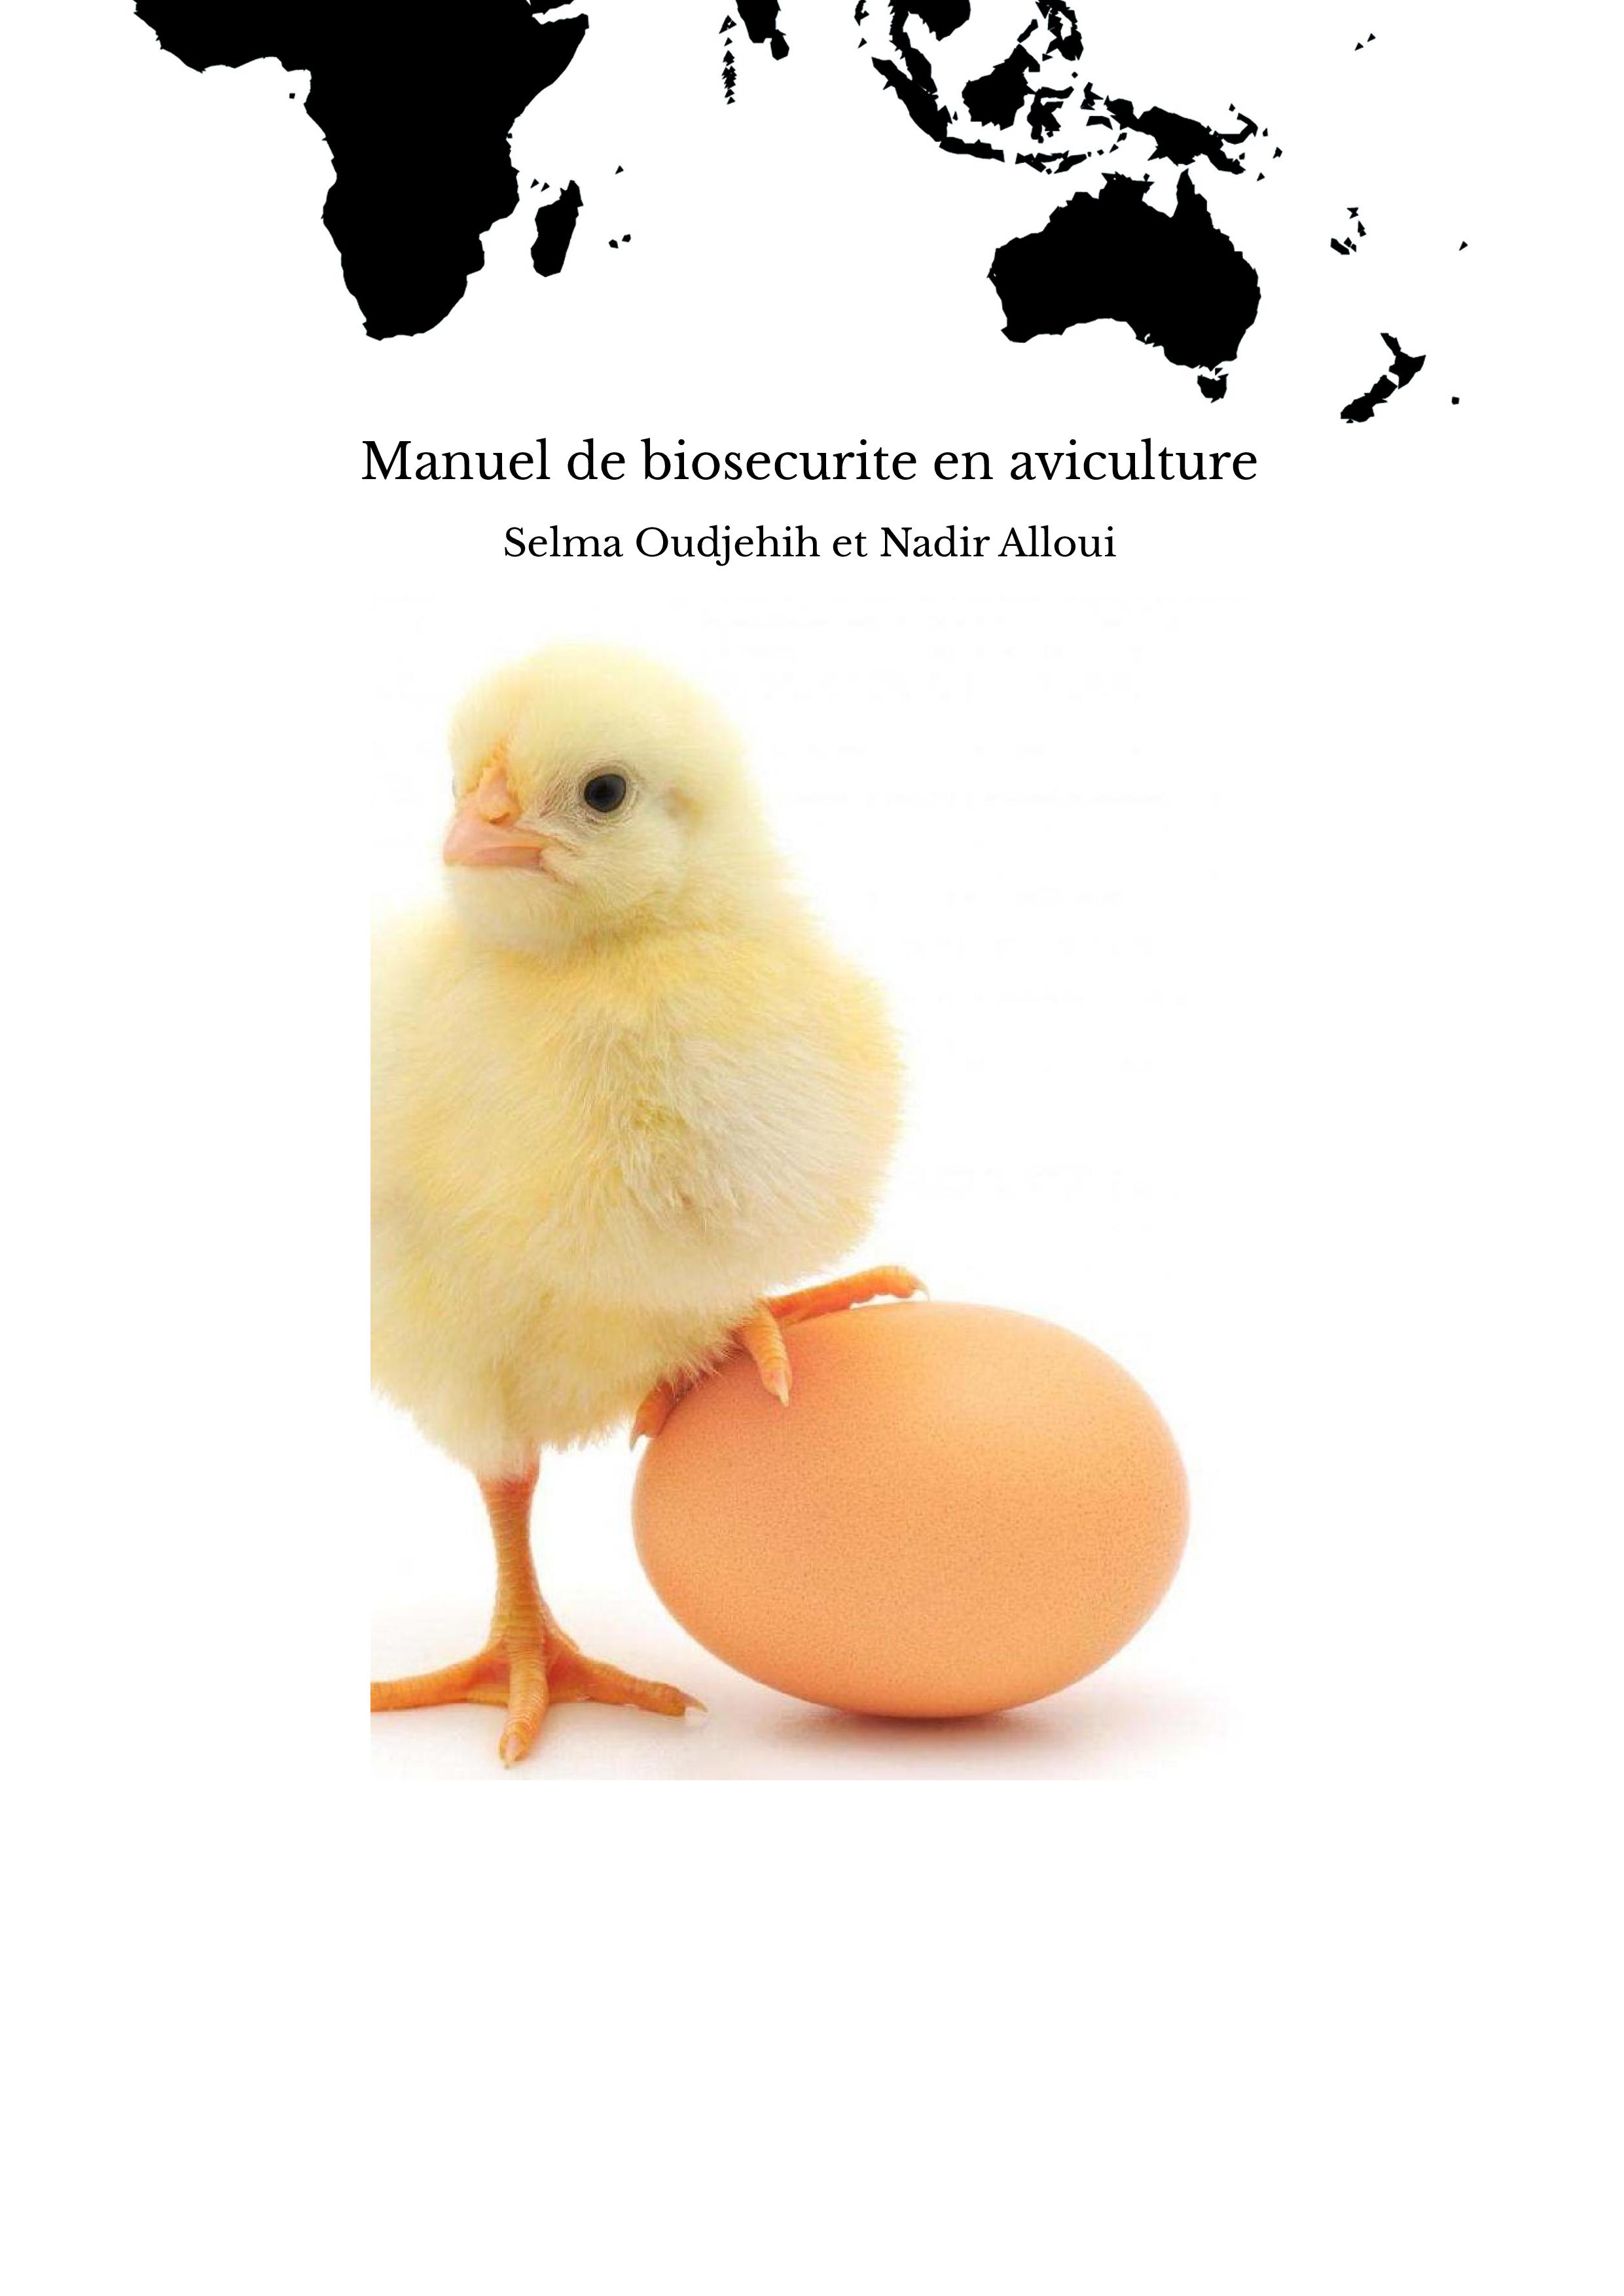 Manuel de biosecurite en aviculture